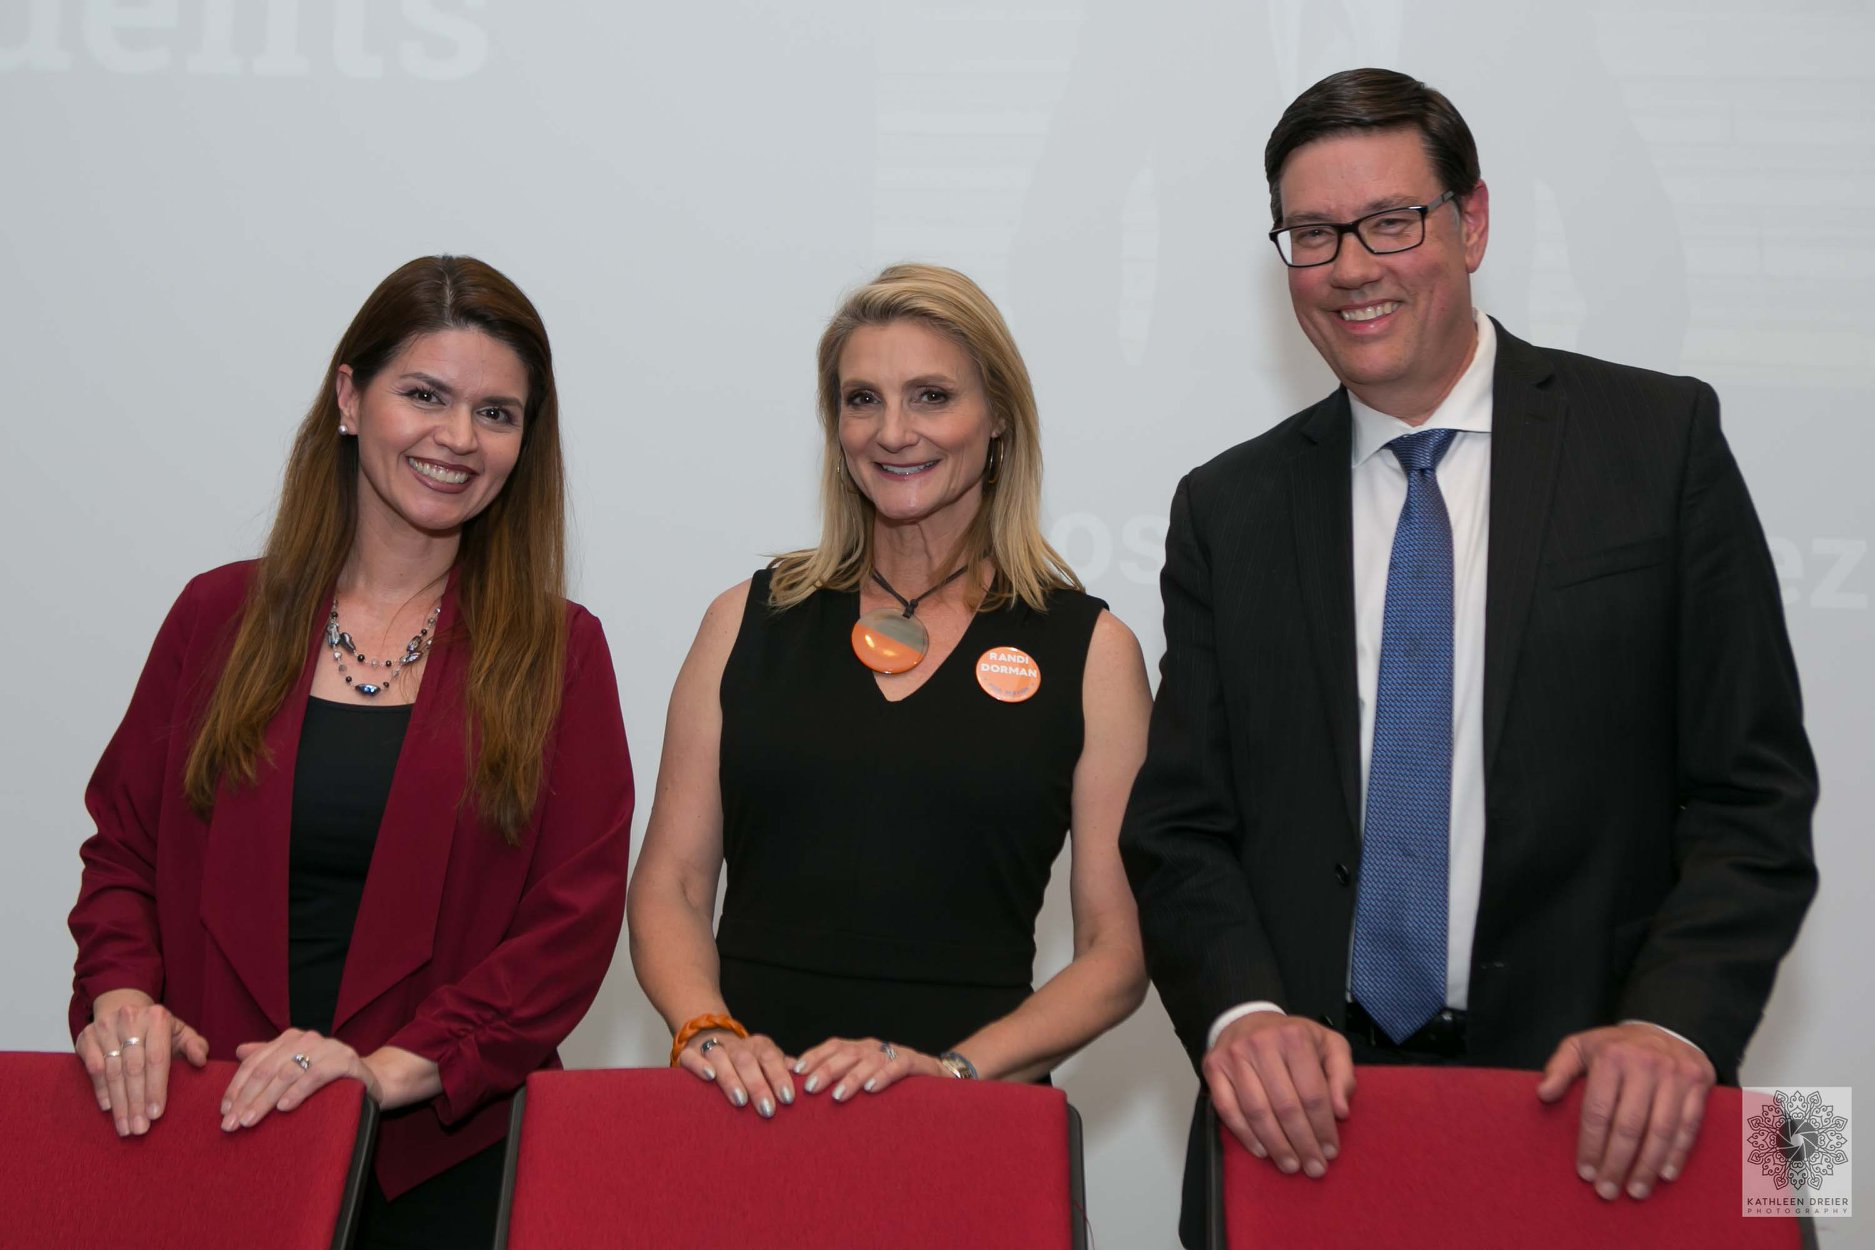 Mayoral candidates Regina Romero, Randi Dorman, and Steve Farley © Kathleen Dreier Photography